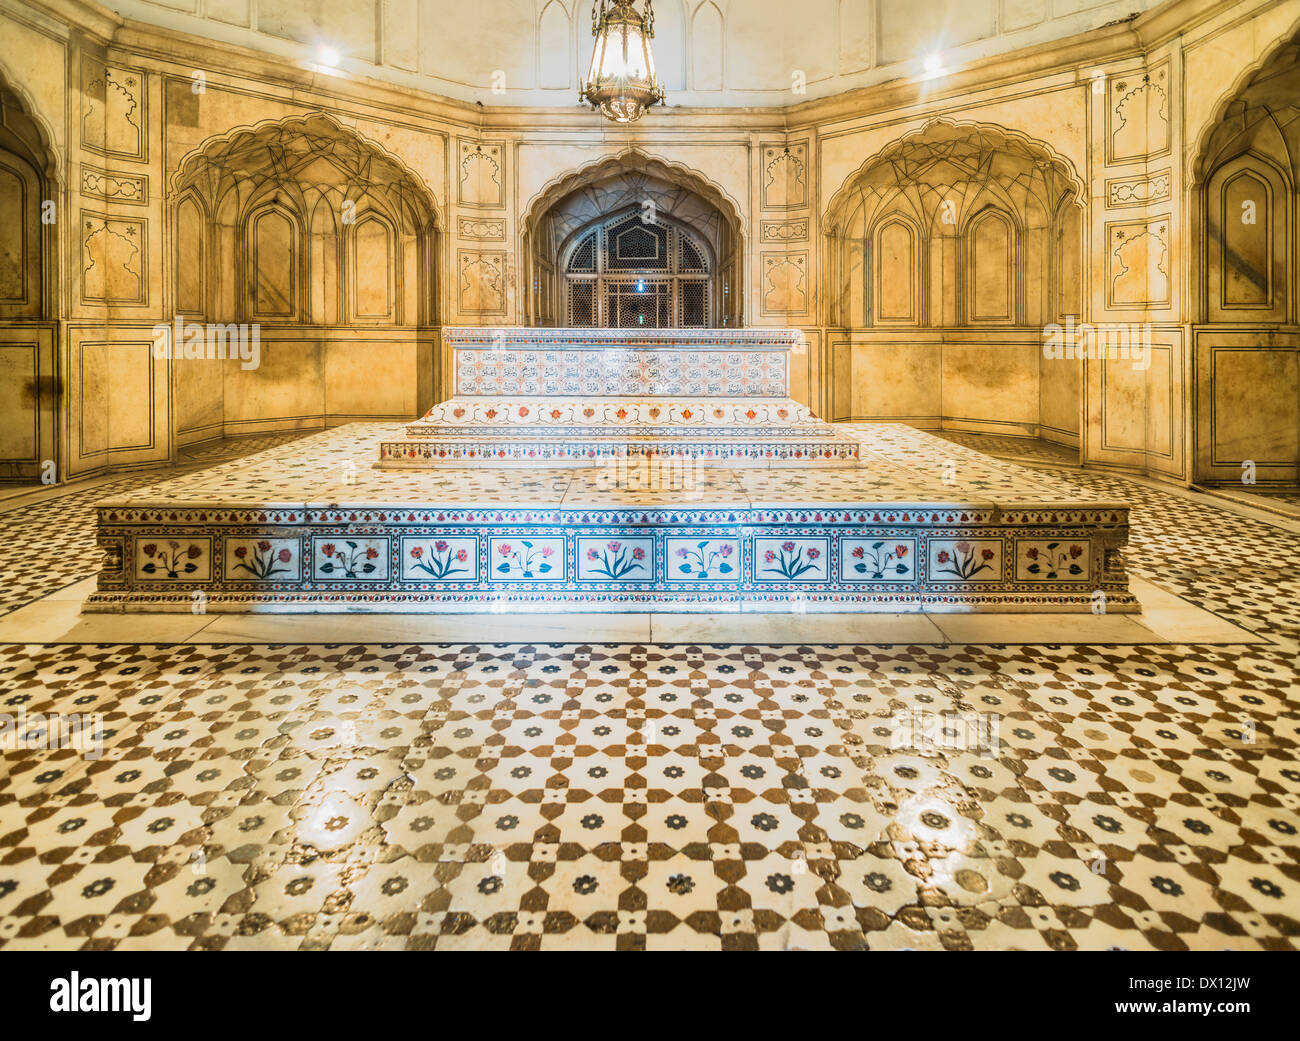 Jahangir's Tomb interior Lahore Pakistan - Stock Image